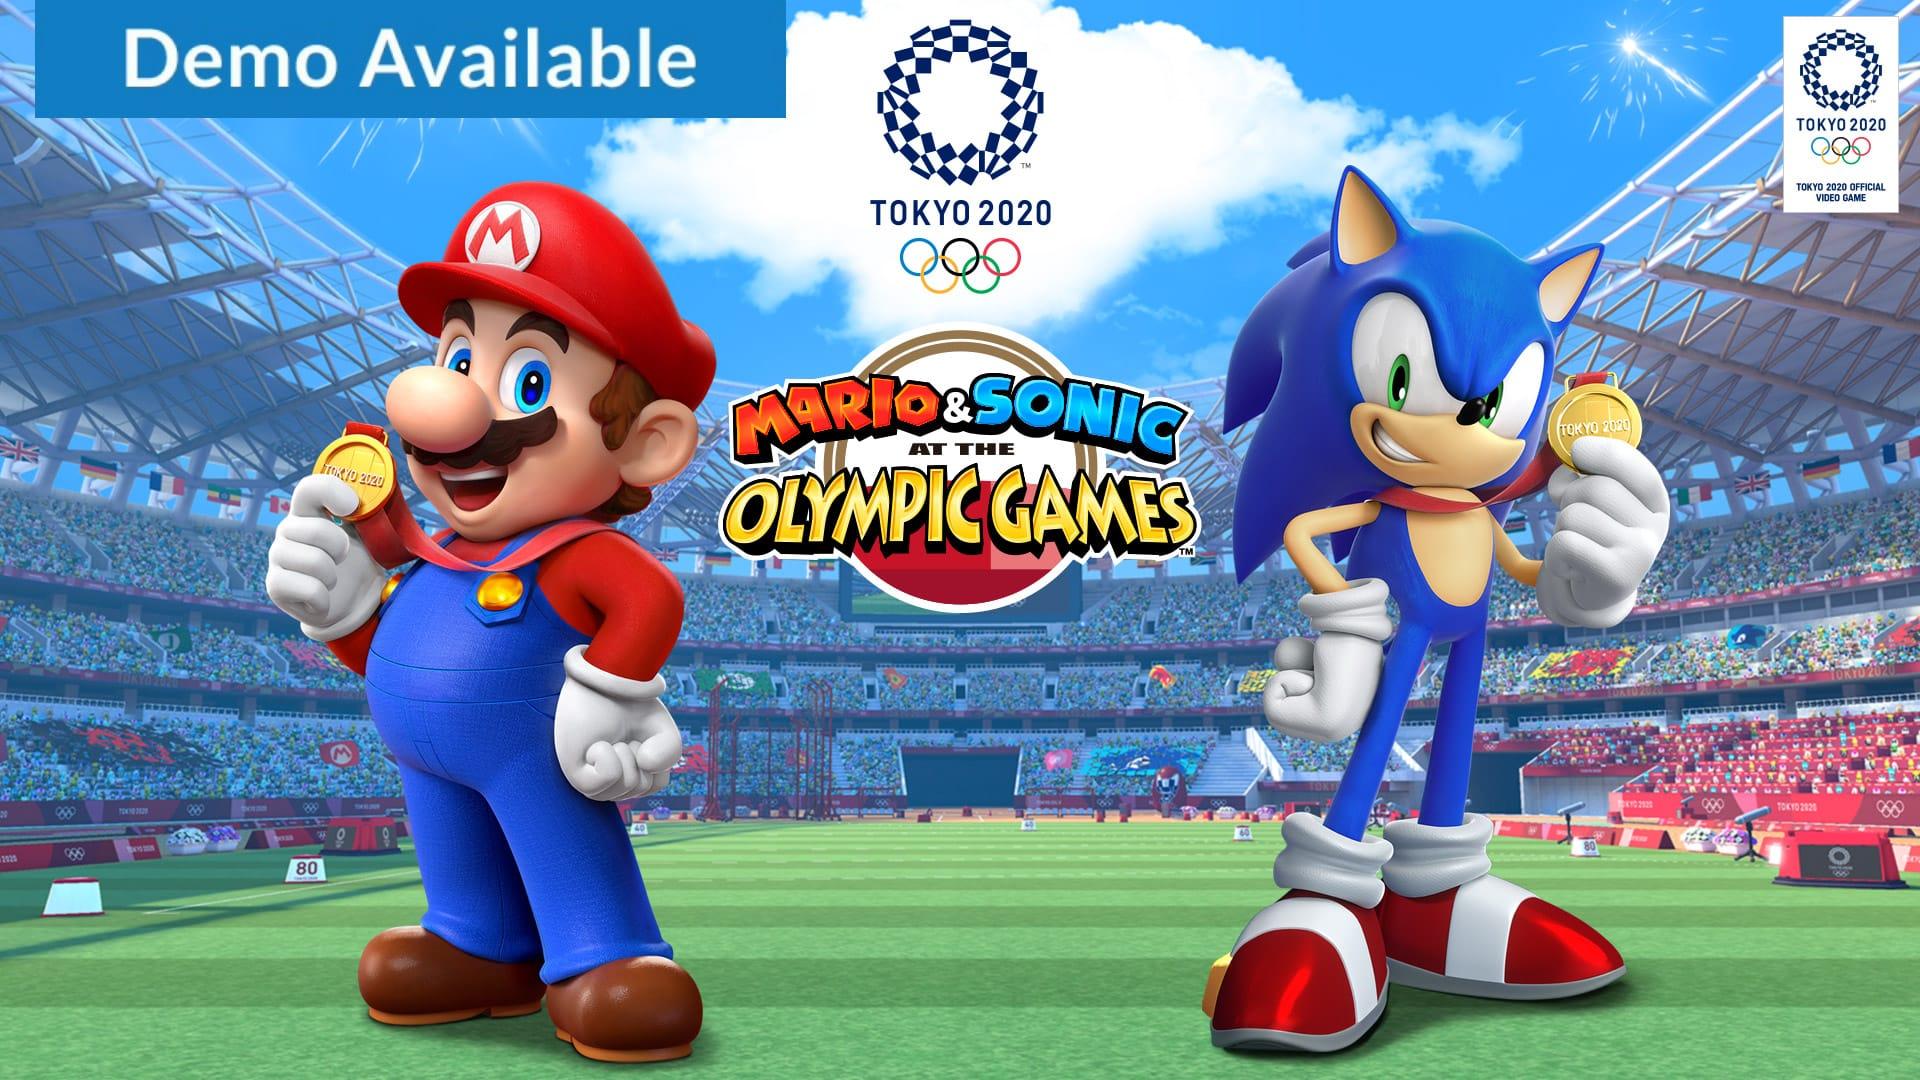 Mario & Sonic, bffs